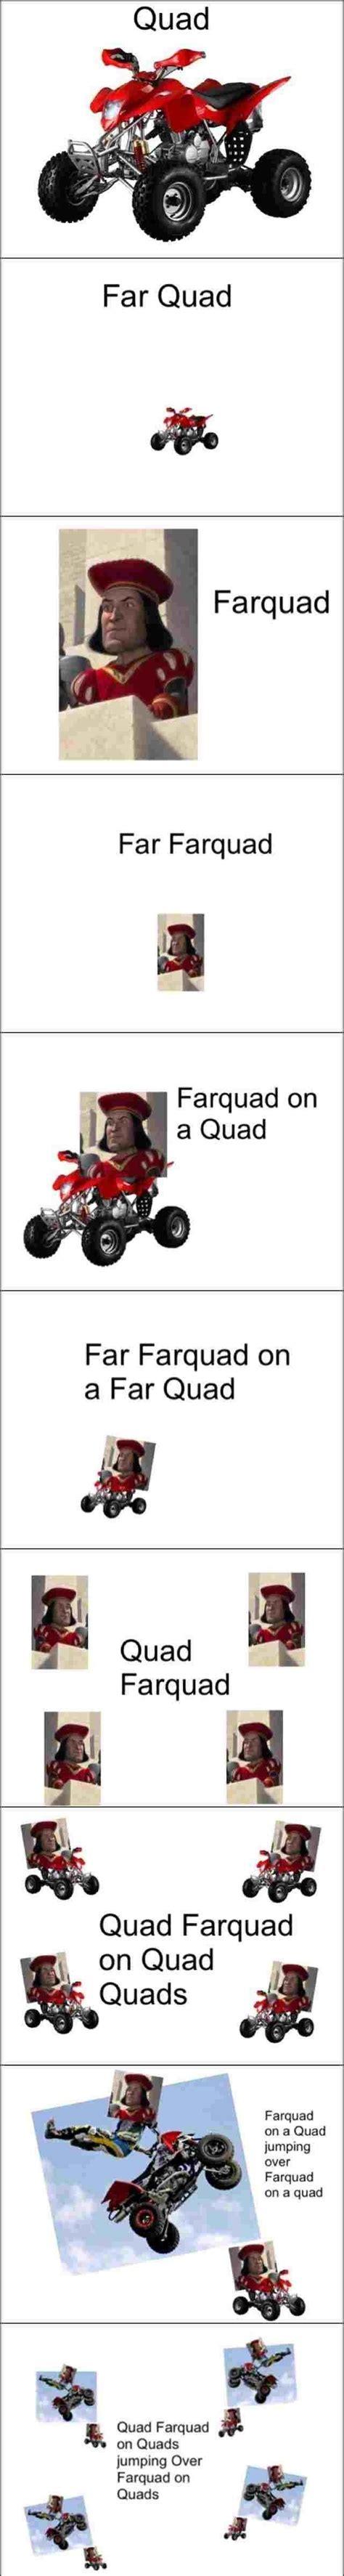 Quad Memes - farquad and quads lord farquaad know your meme